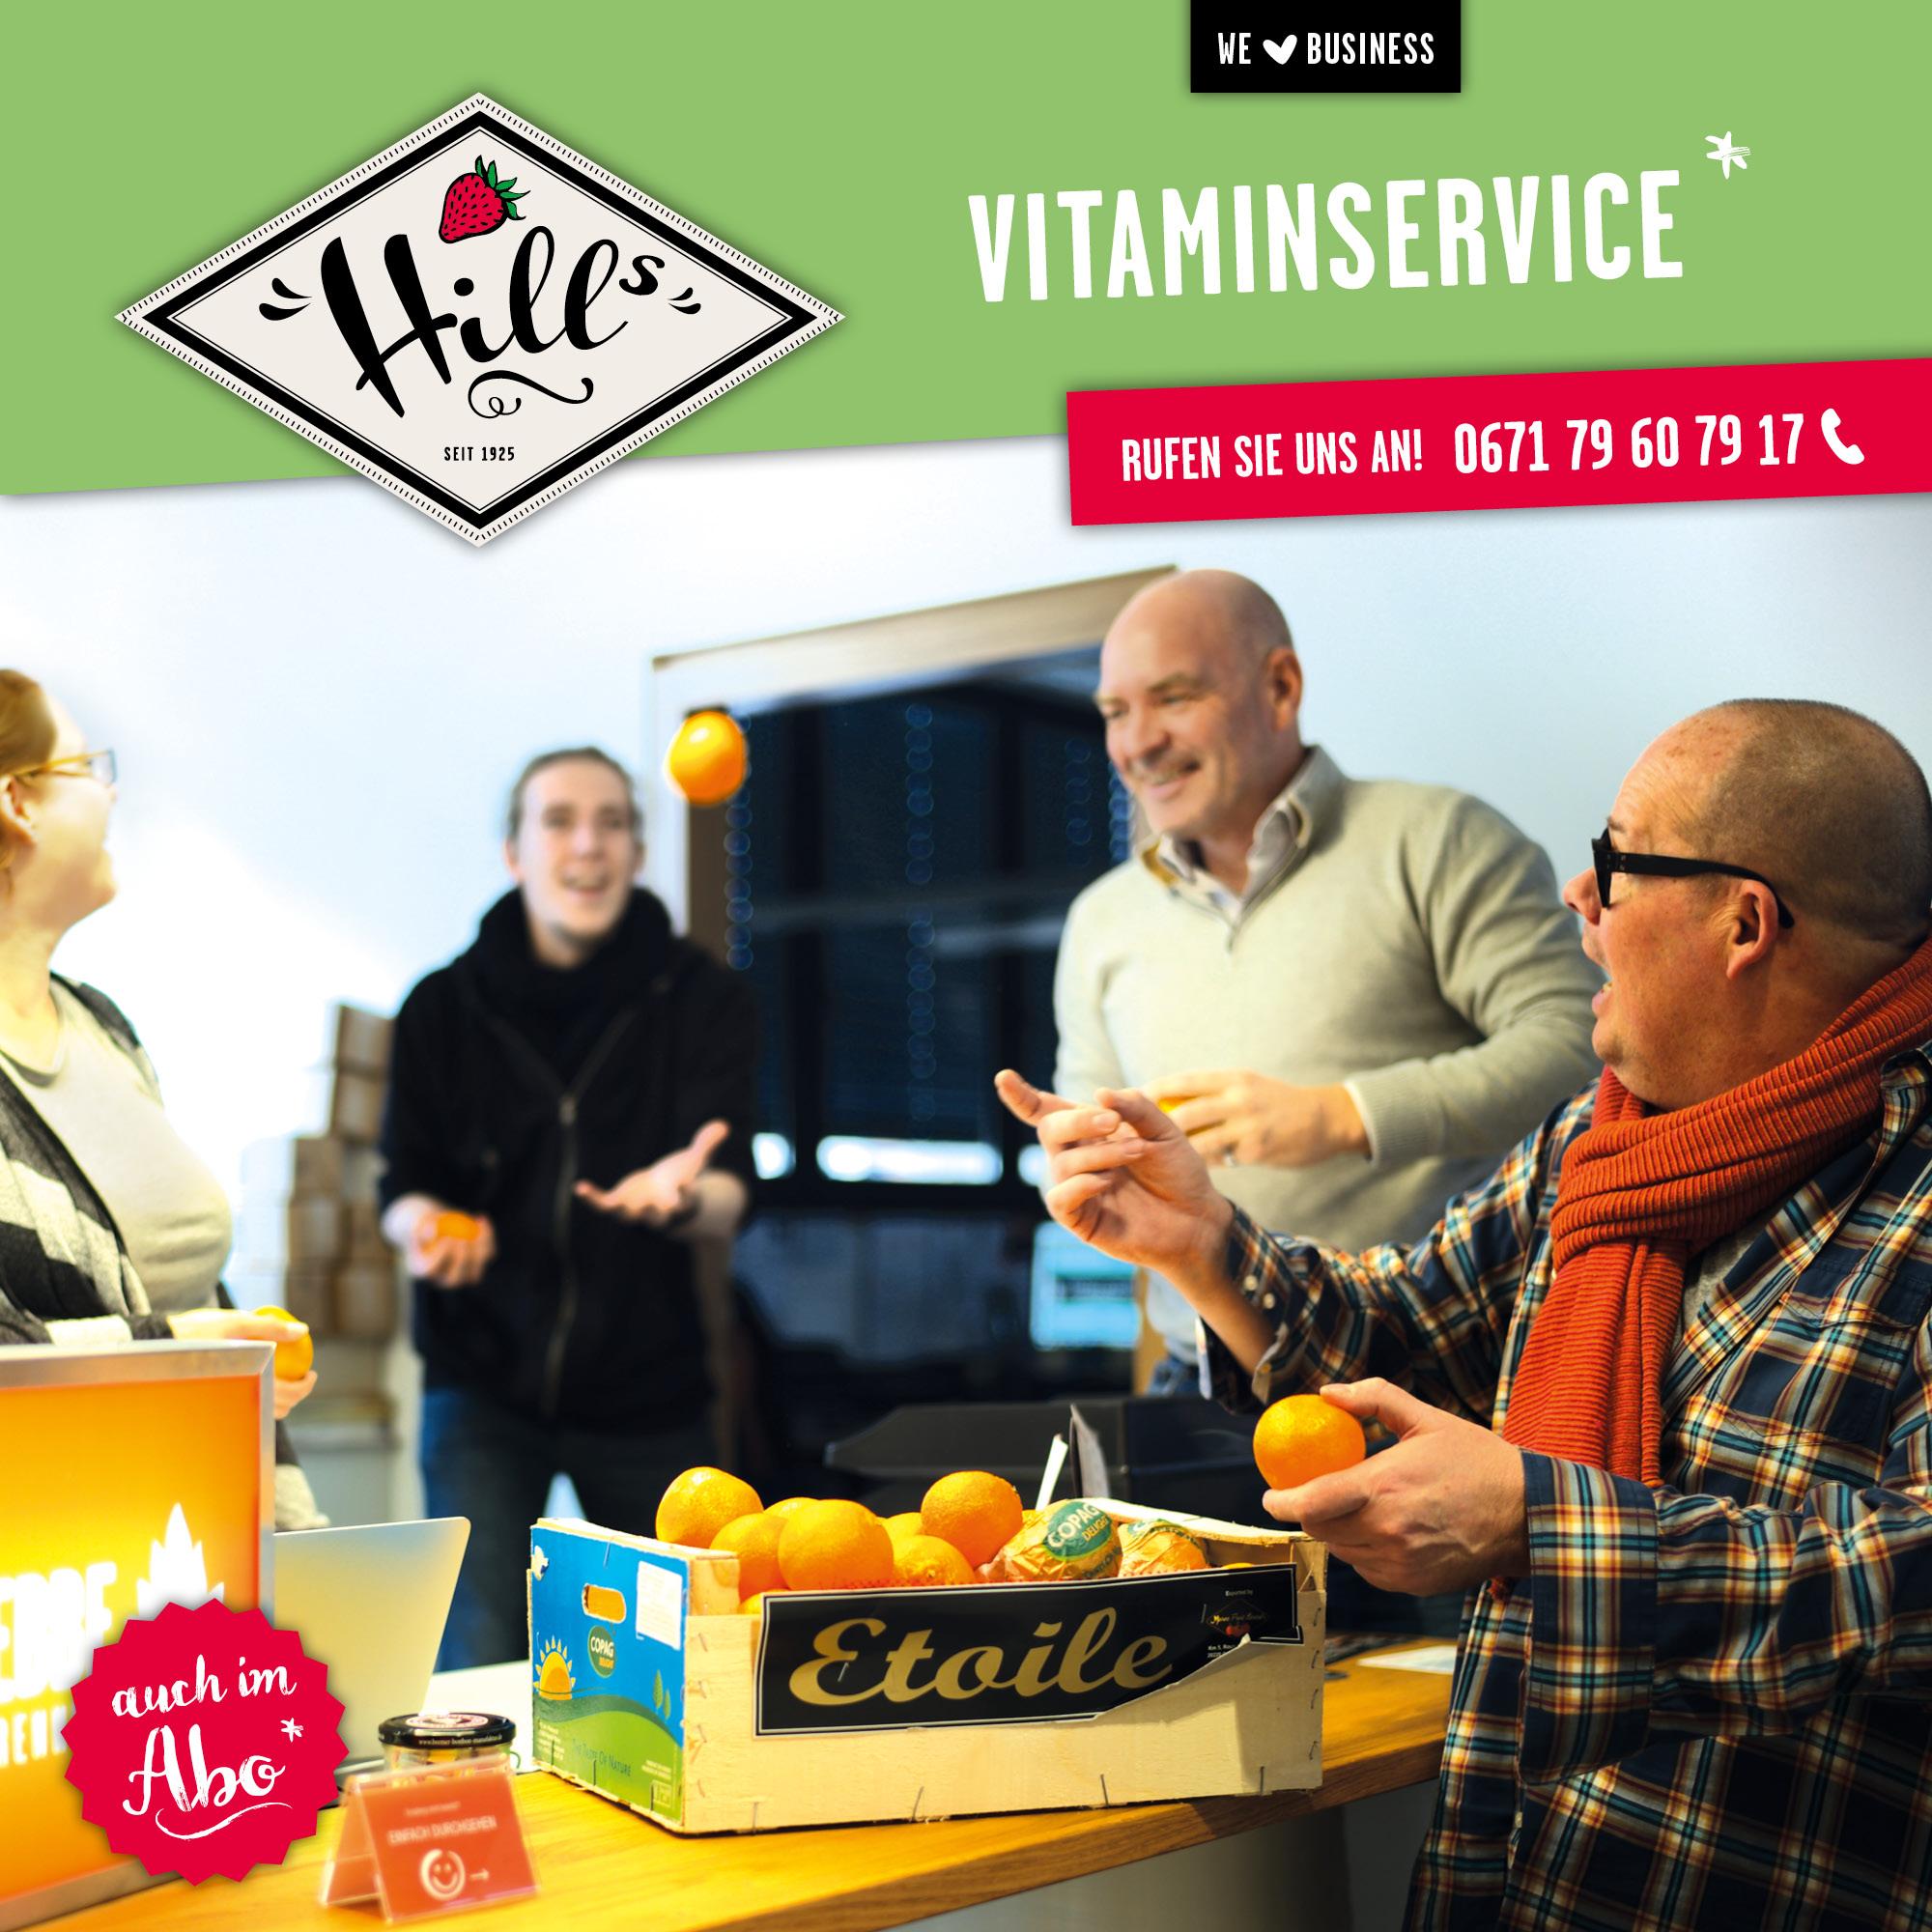 20180416_Hills_Service_Vitaminservice_FB2.jpg